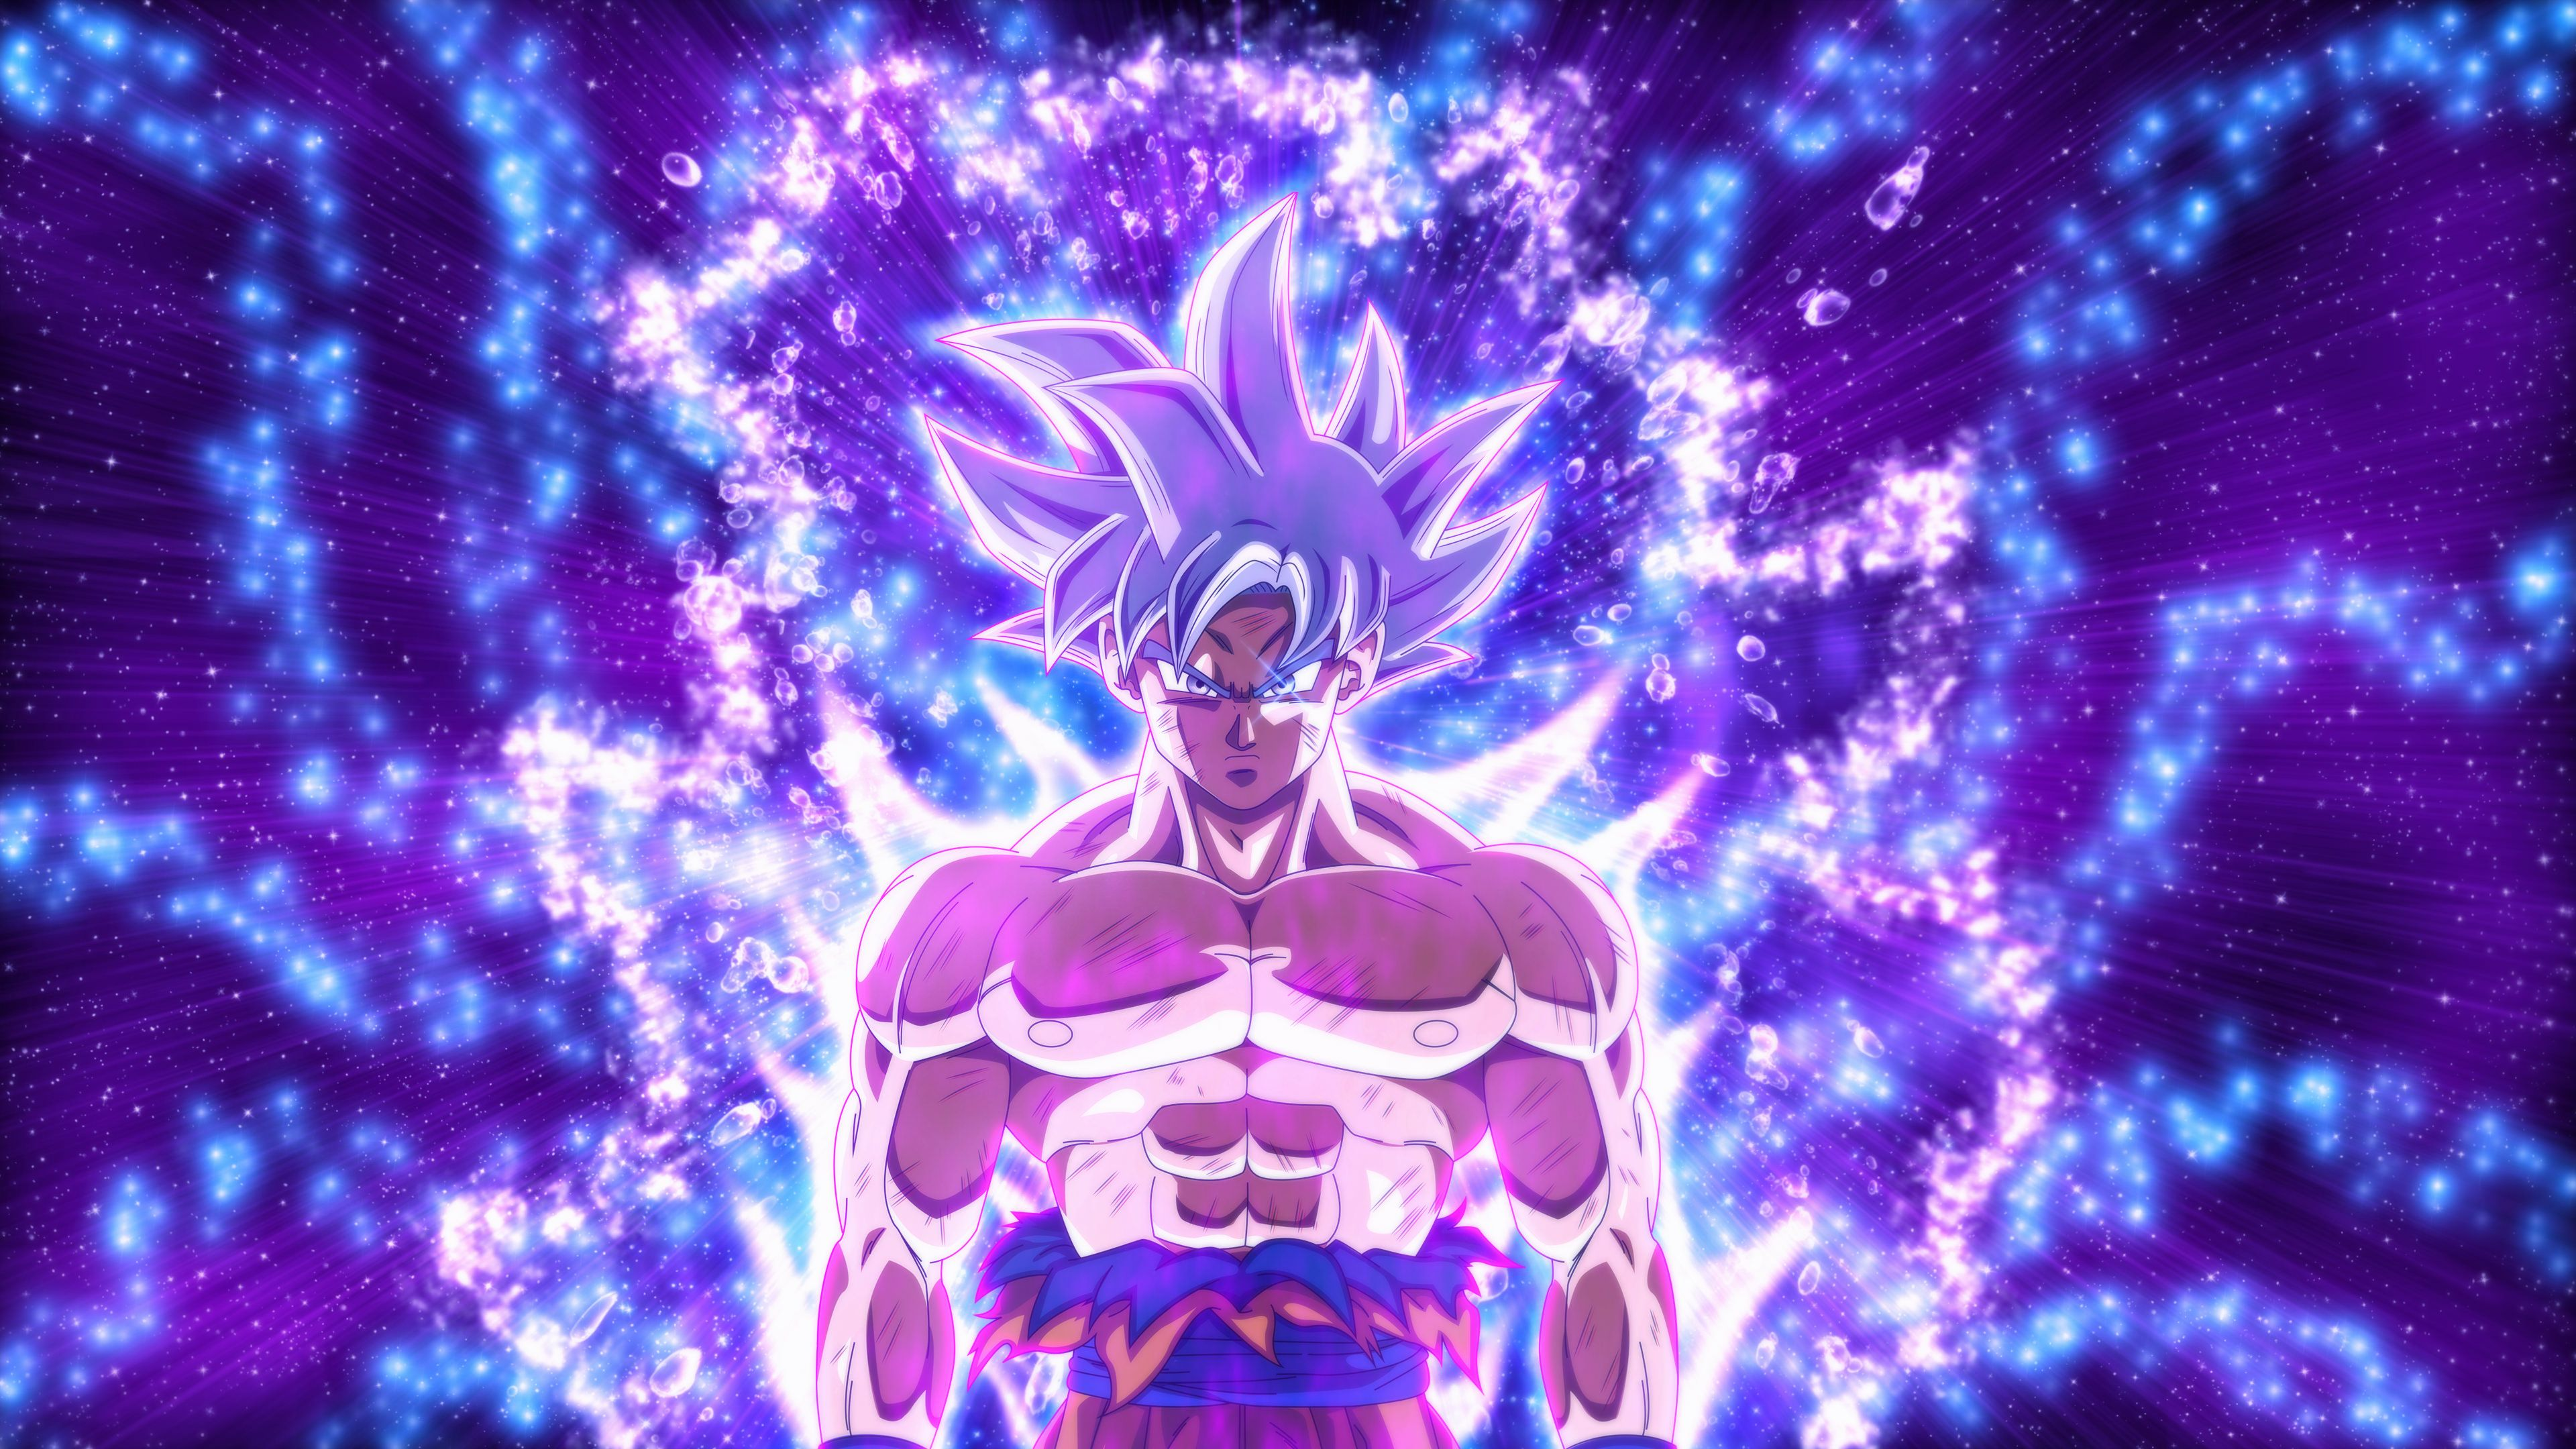 Phone Goku Ultra Instinct Hd Wallpaper 4k